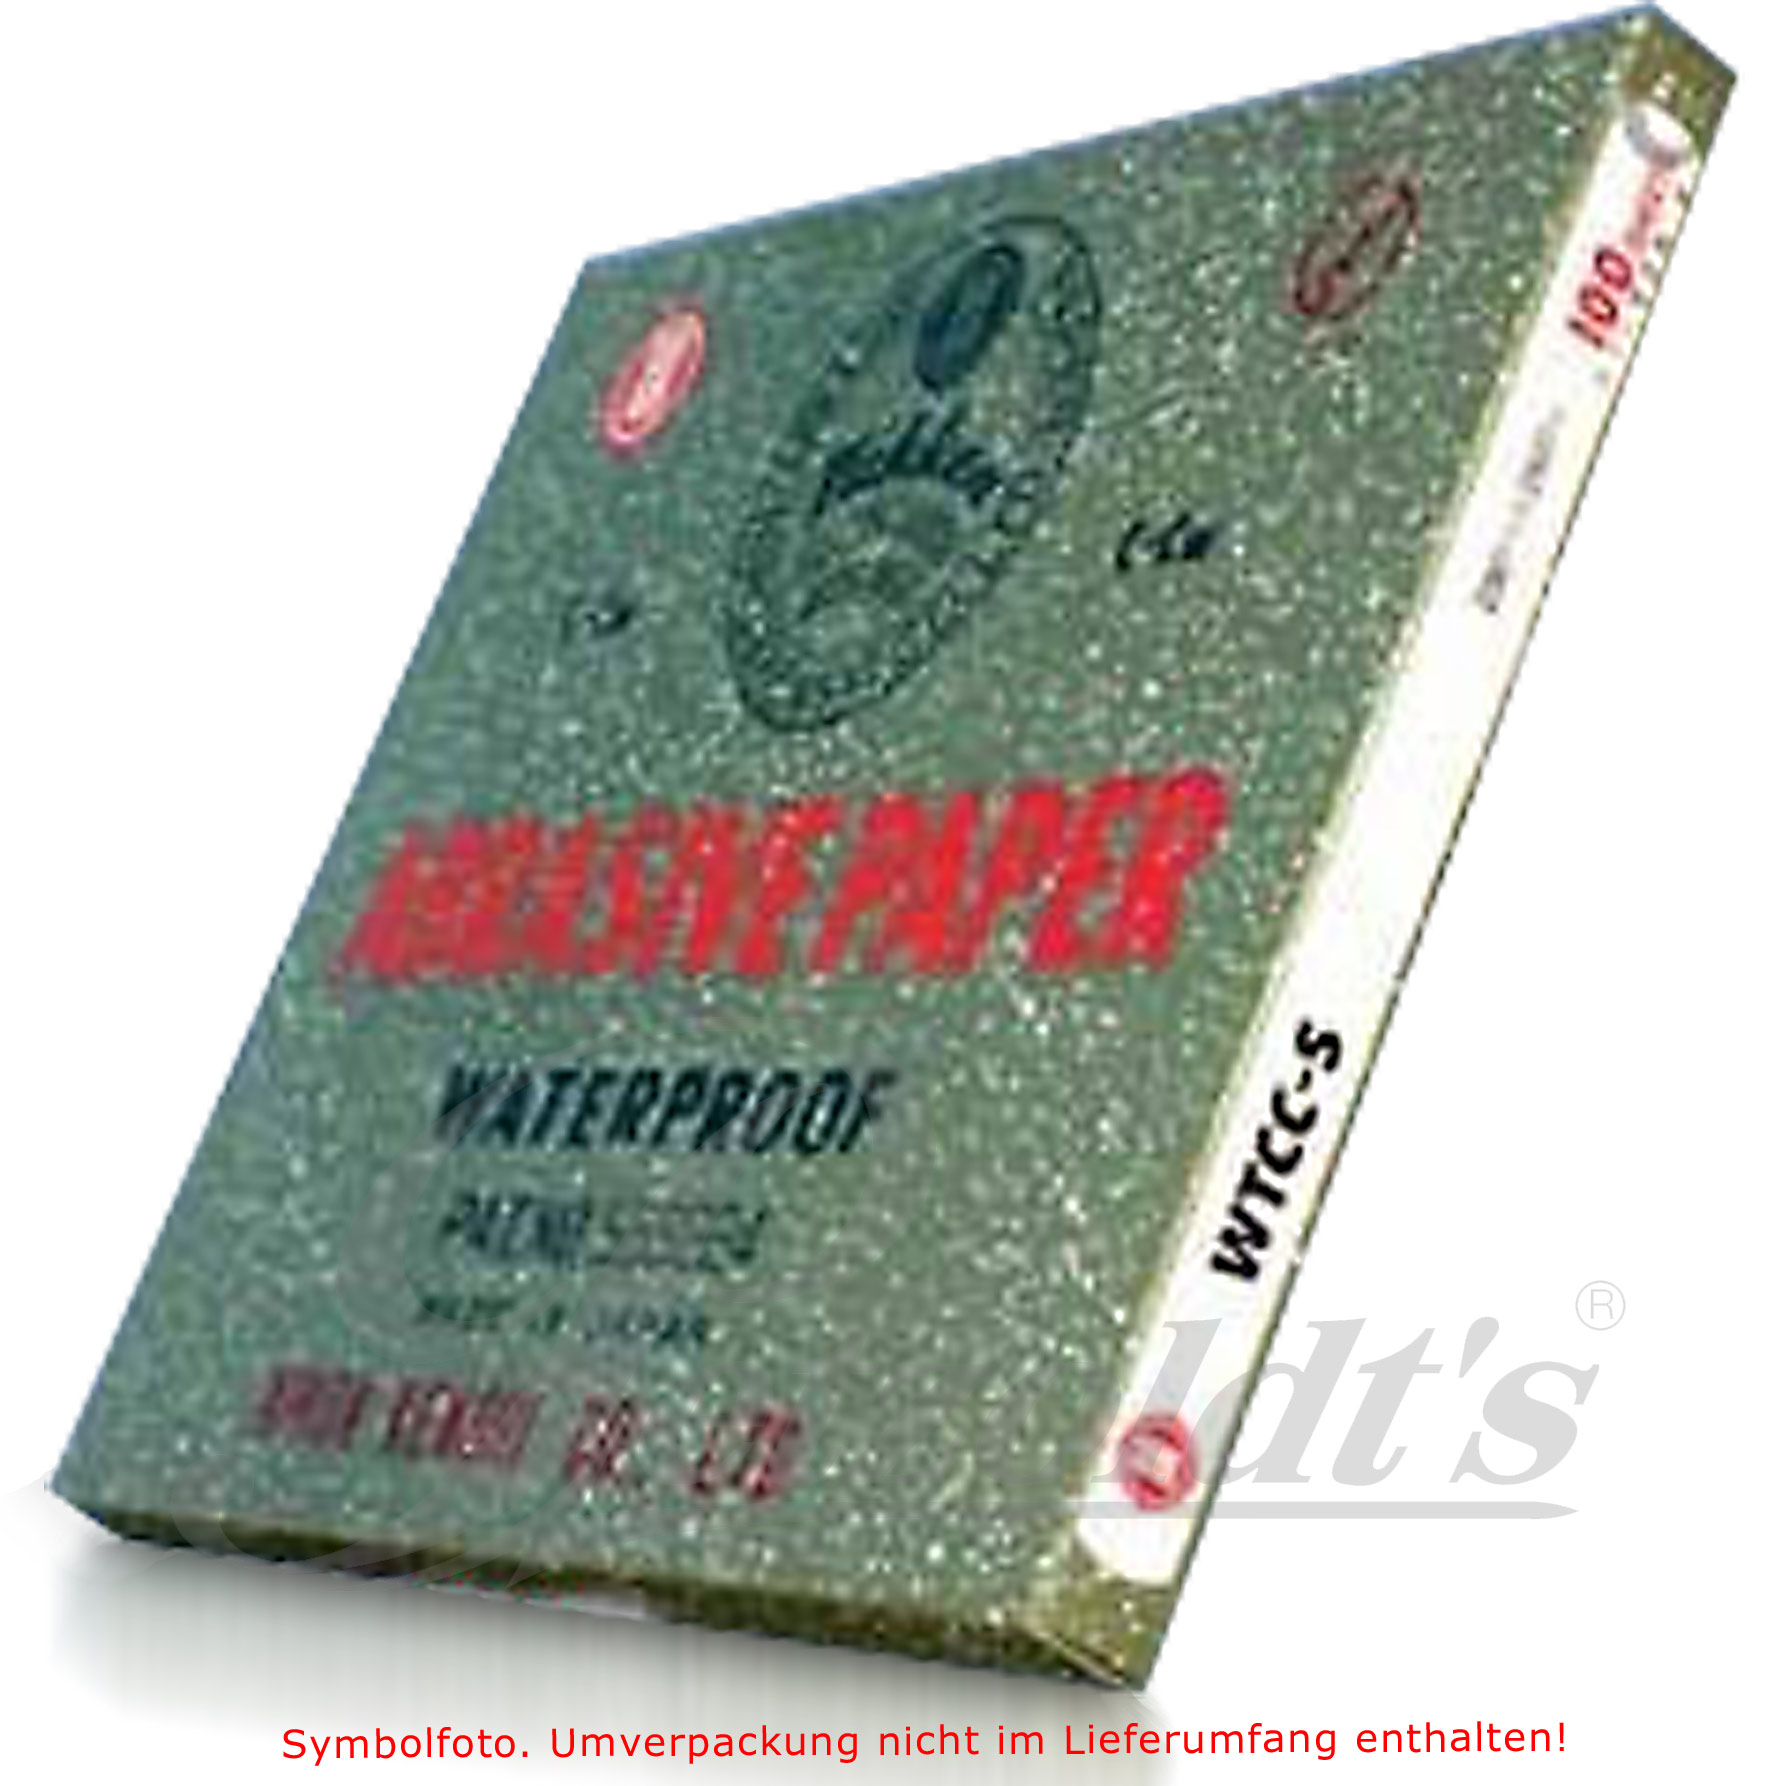 Nikken Nass-Schleifpapier, 800,1200,1500, 2000, 2500, 3000